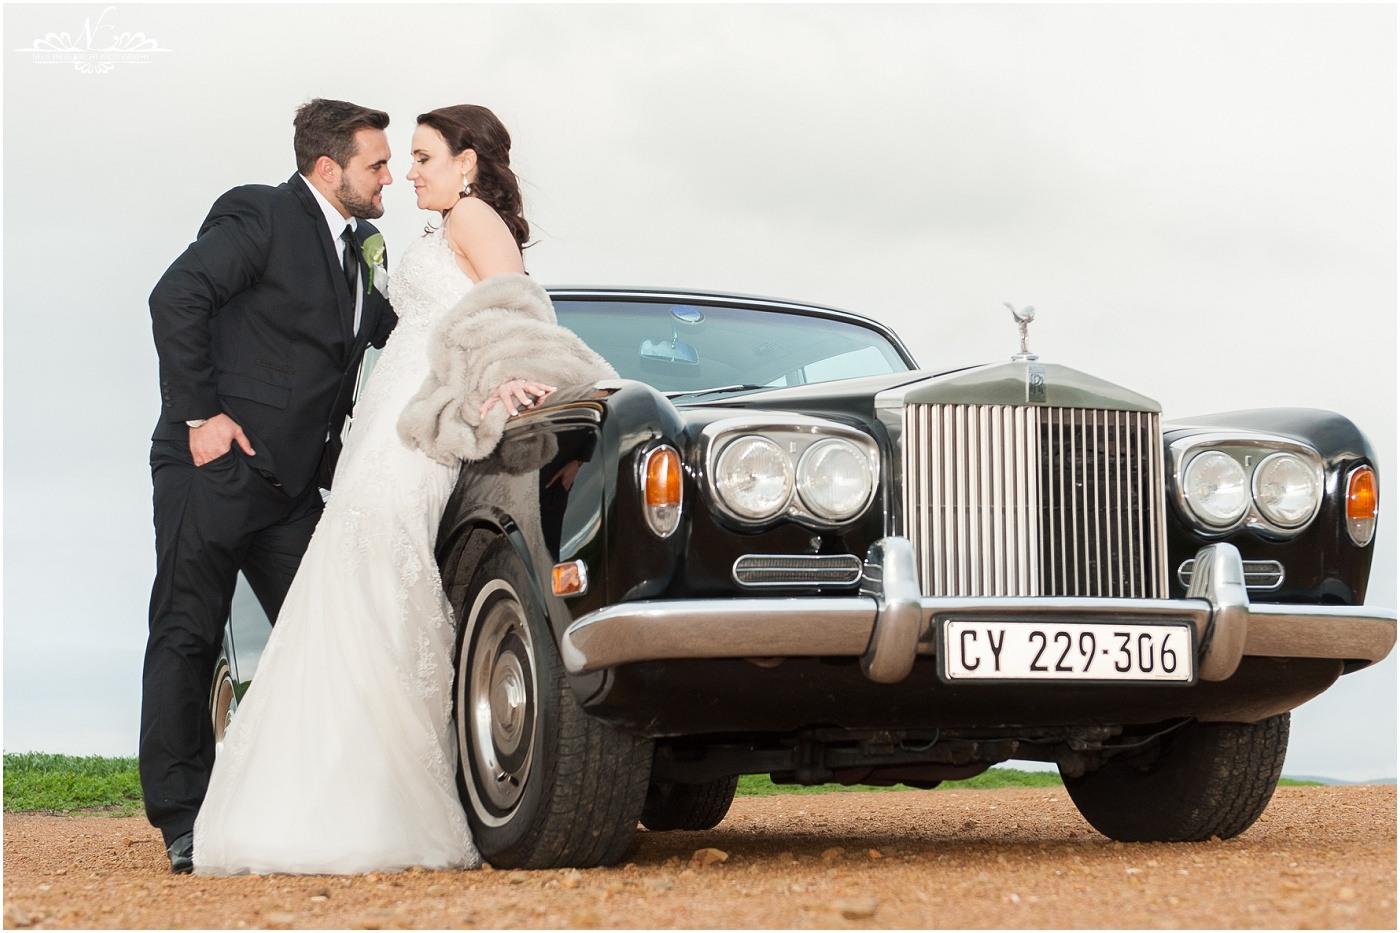 Eensgezind-Wedding-Photos-Nelis-Engelbrecht-Photography-111